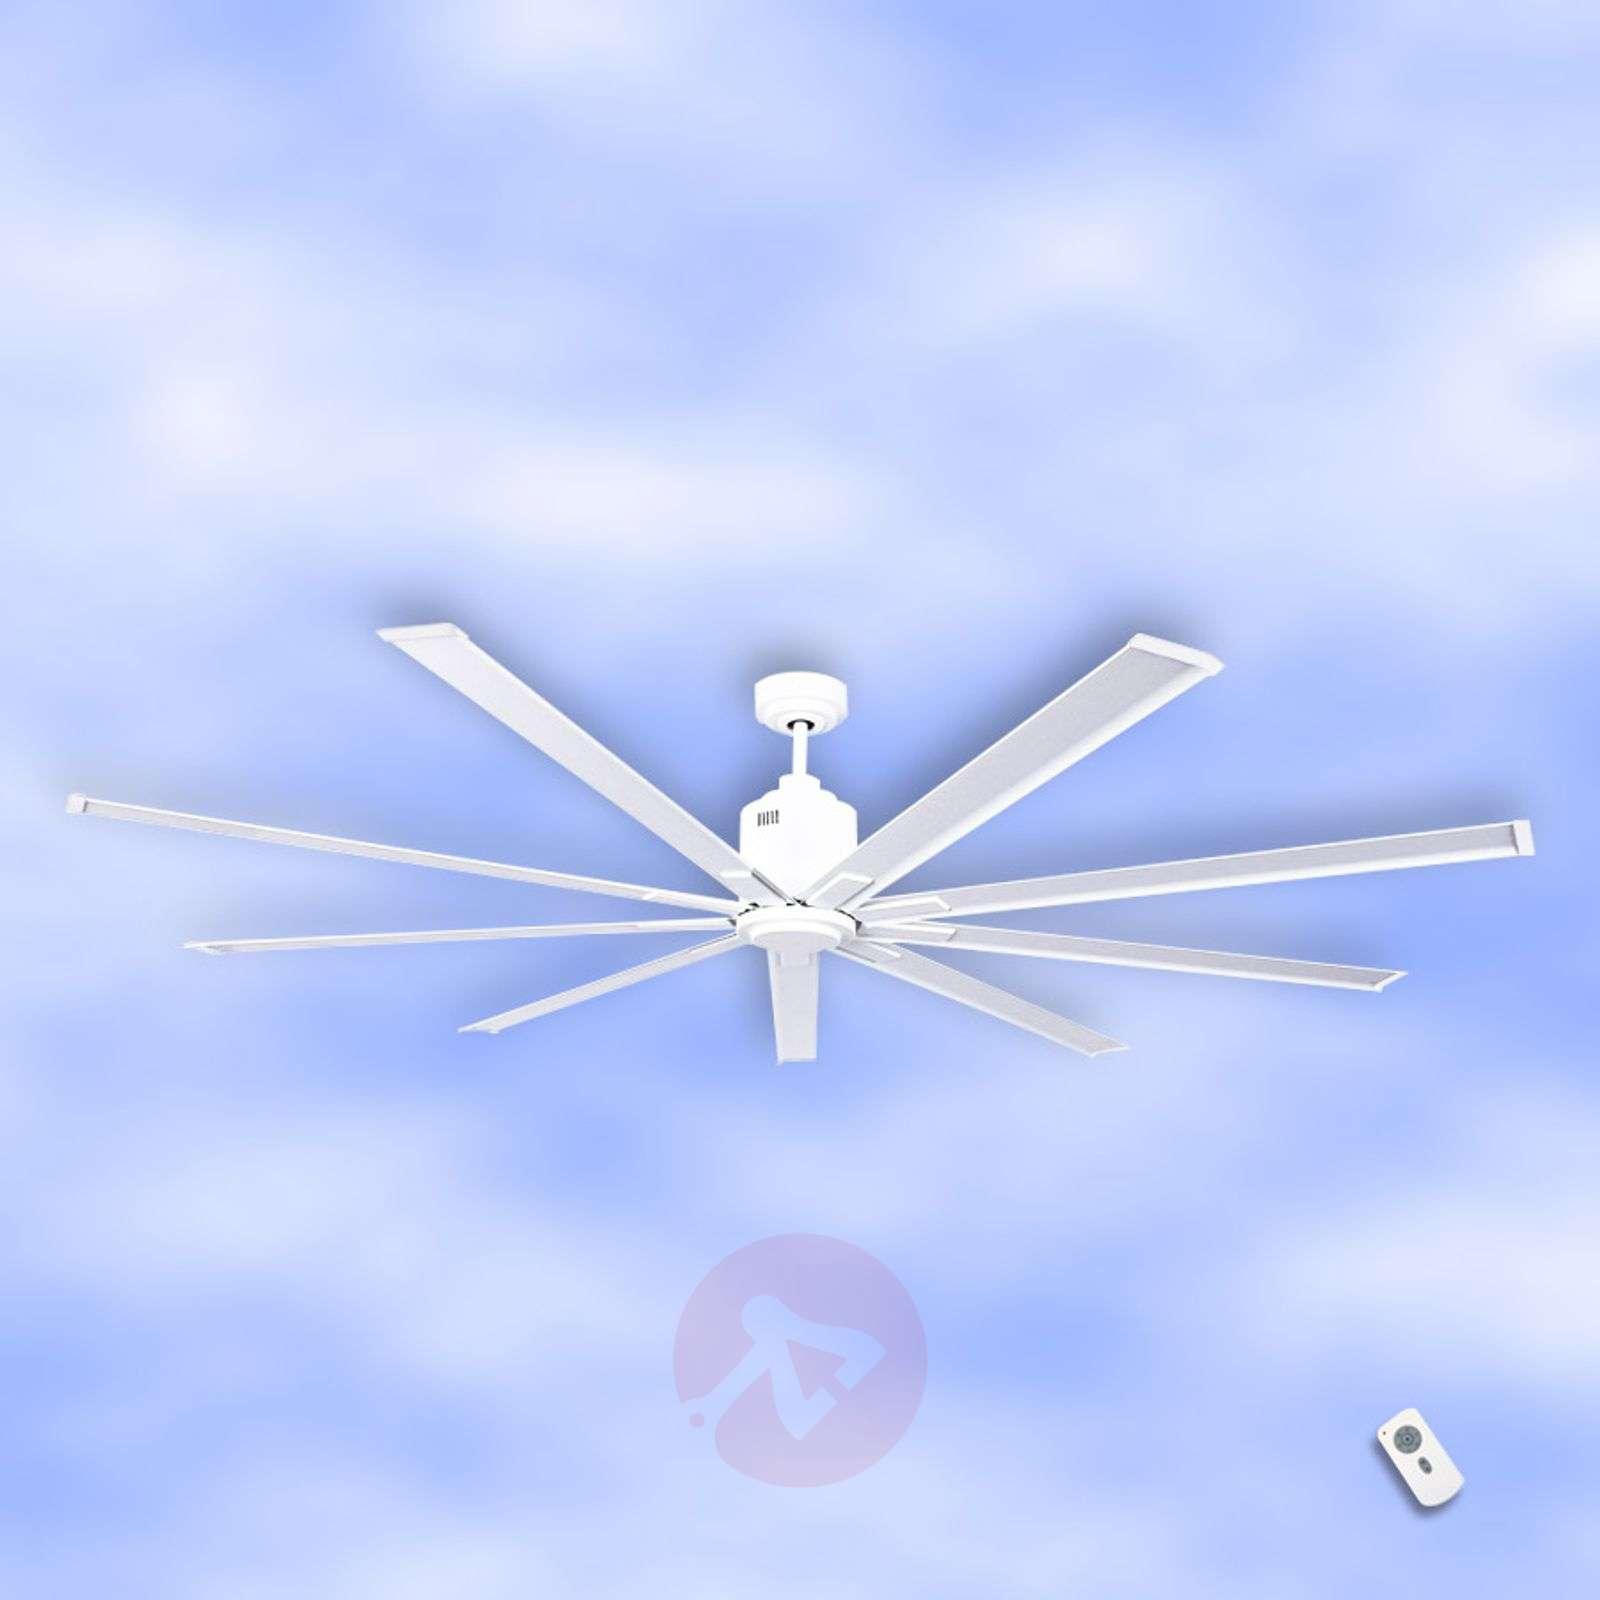 Big Smooth Eco-kattotuuletin, 220 cm, valkoinen-2015070-01